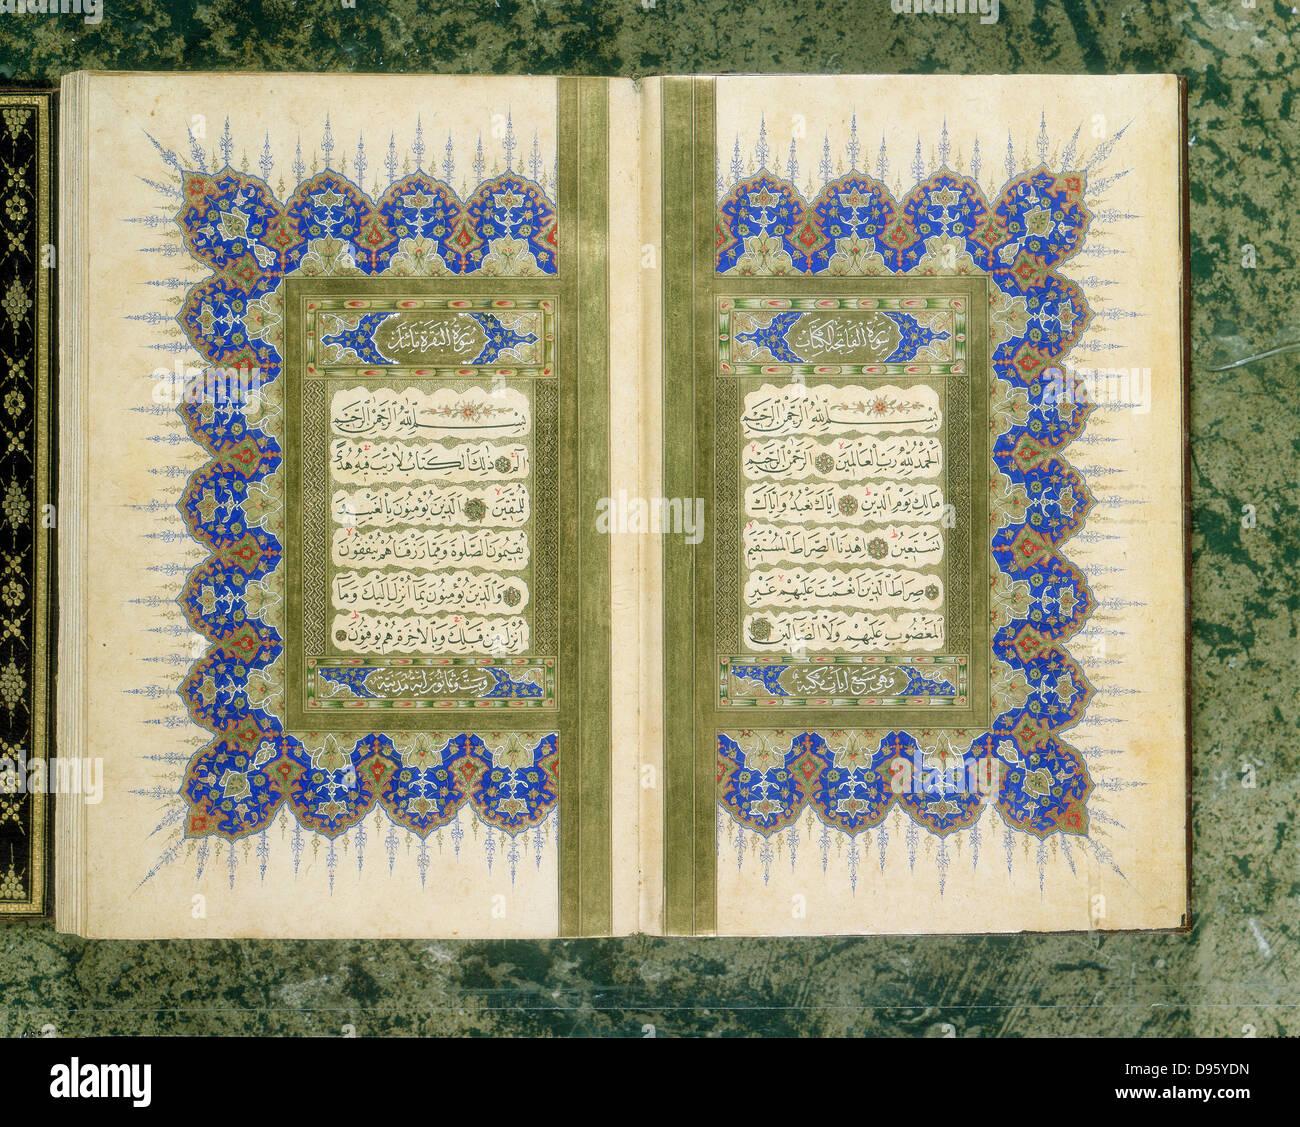 Koran. 1867 manuscript. Priavte Collection - Stock Image